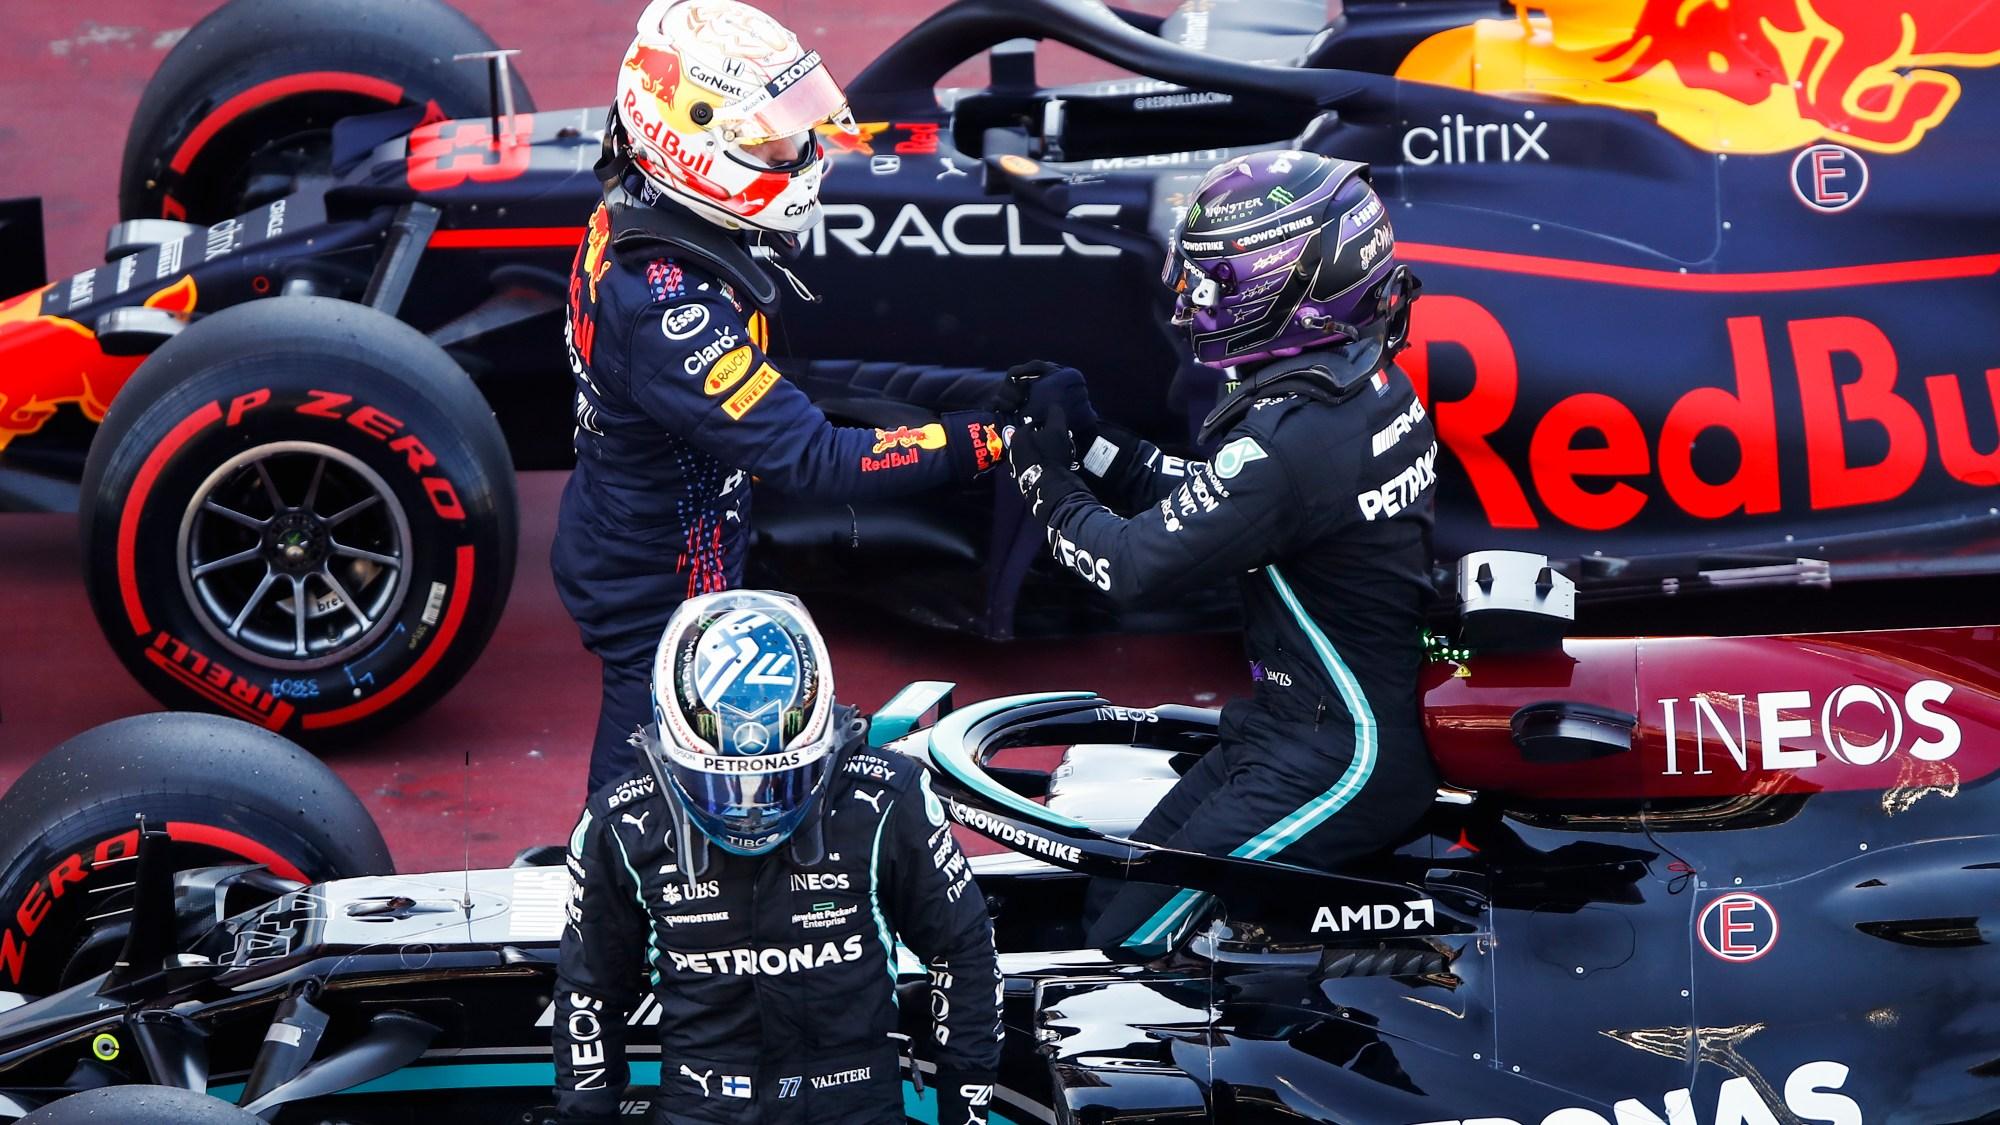 Valtteri Bottas, 2021 Spanish GP